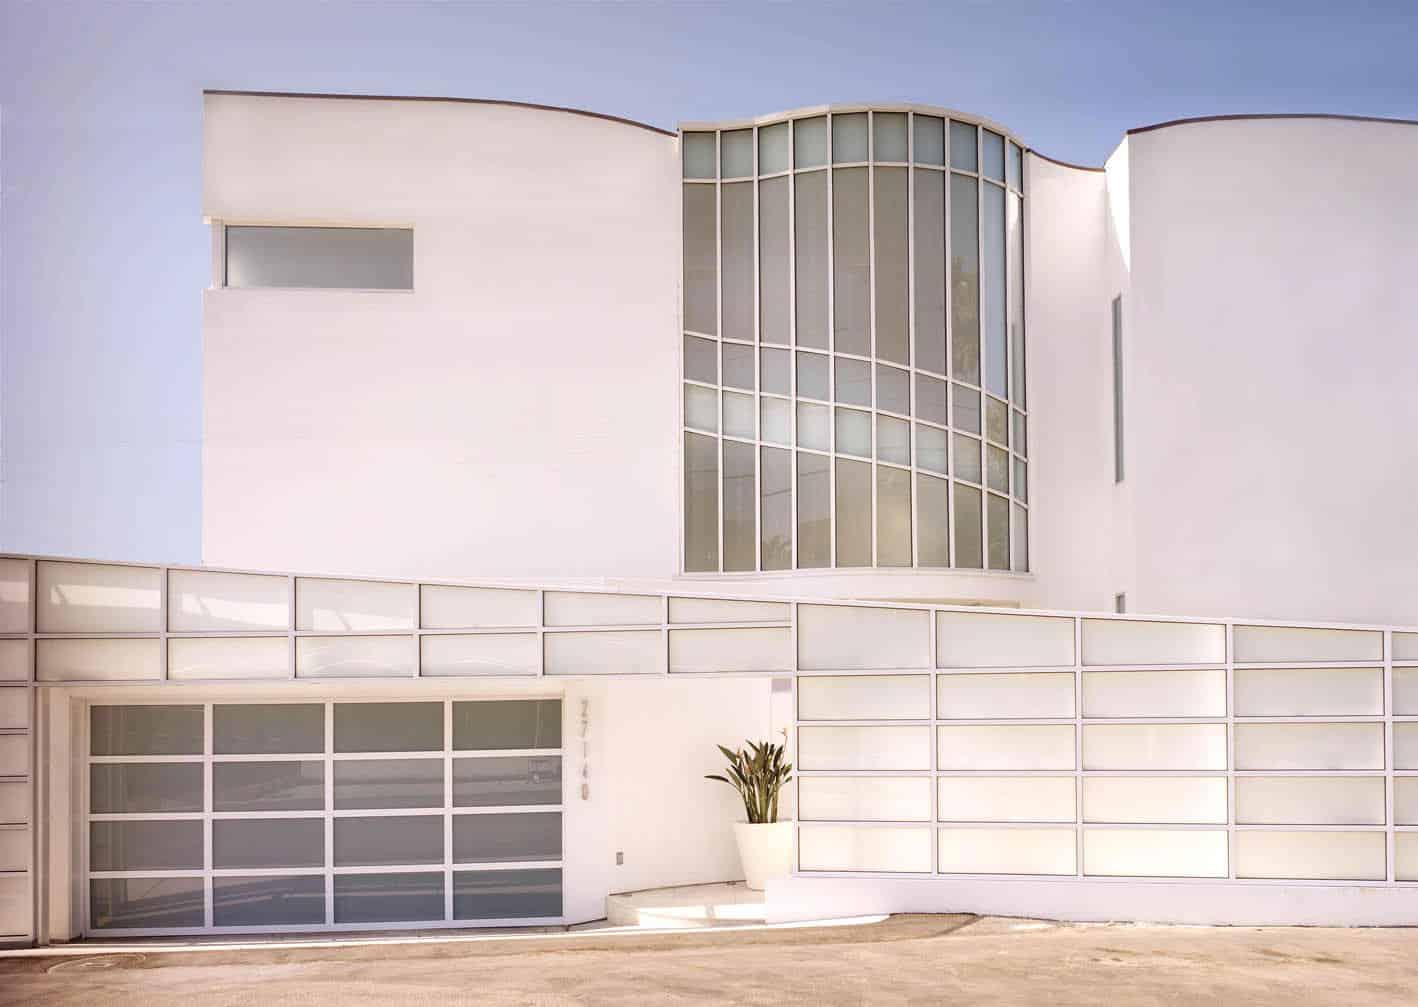 Malibu Beach House by Jamie Bush & Co. (1)